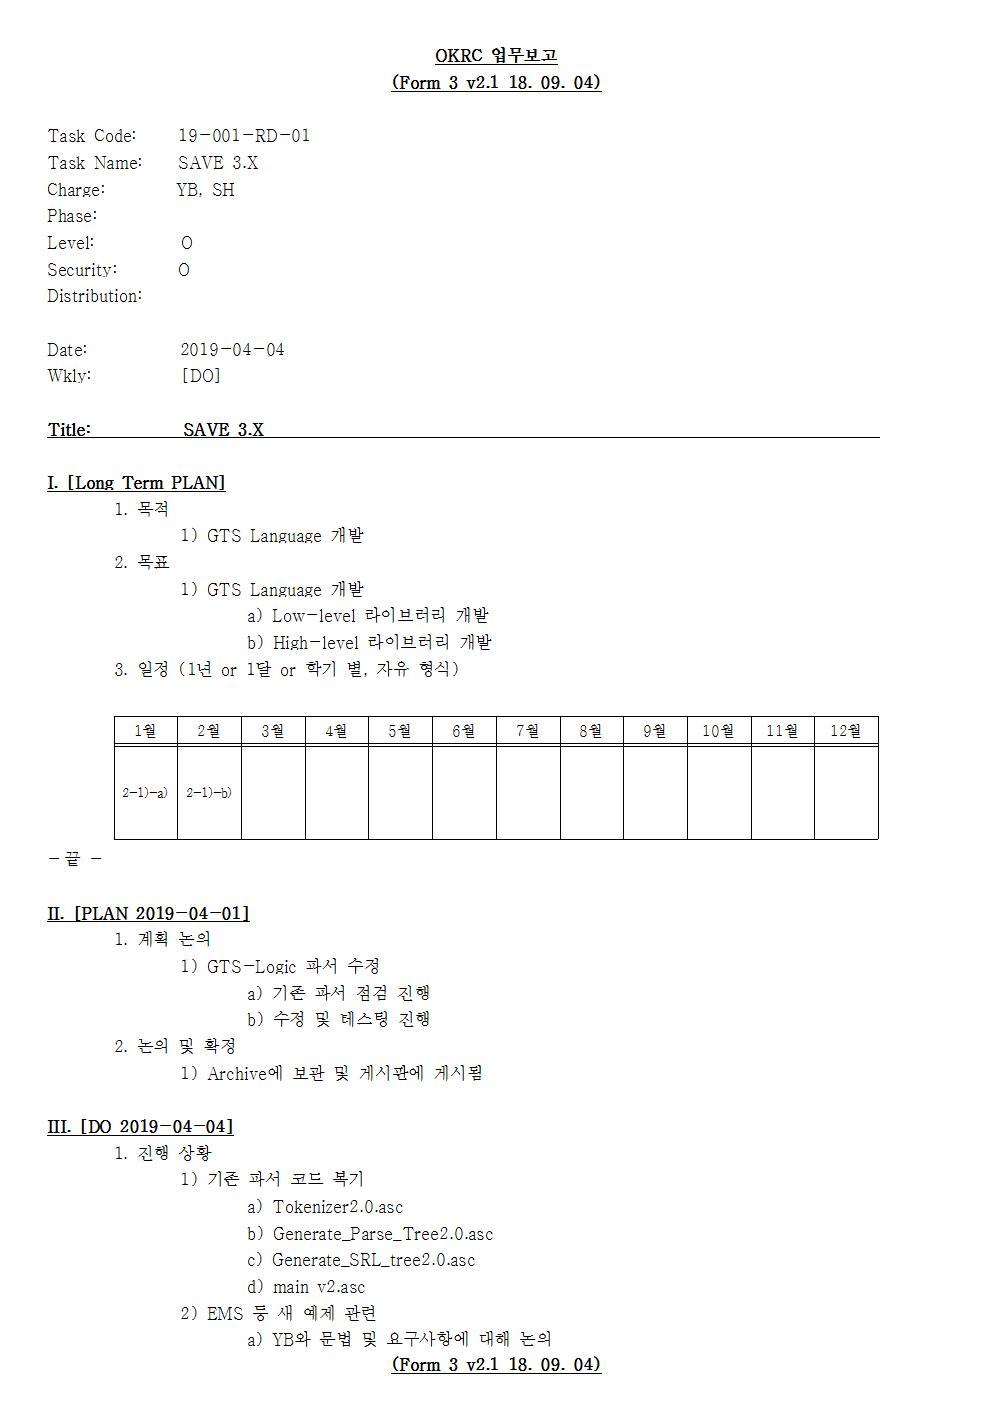 D-[19-001-RD-01]-[SAVE 3.X]-[2019-04-04][SH]001.jpg